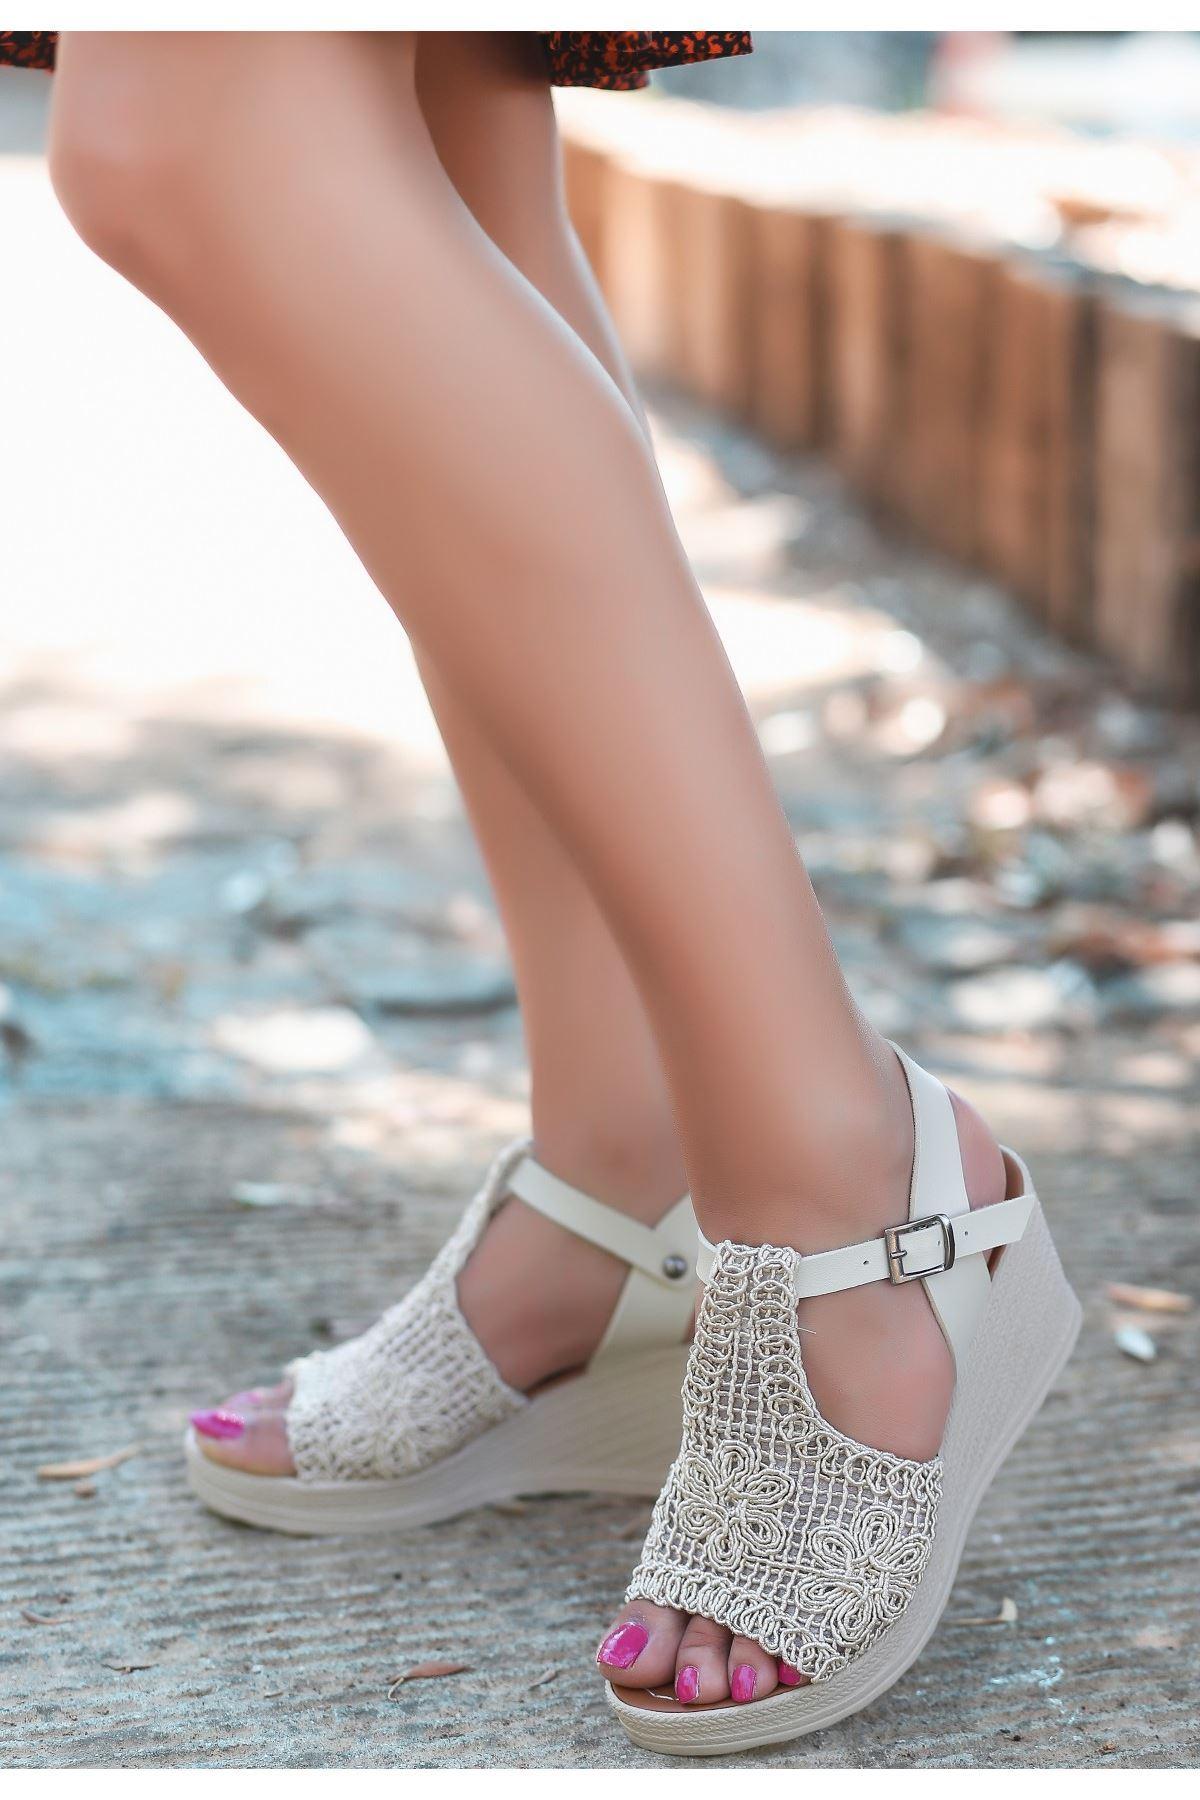 Simo Krem Örgülü Dolgu Topuk Sandalet